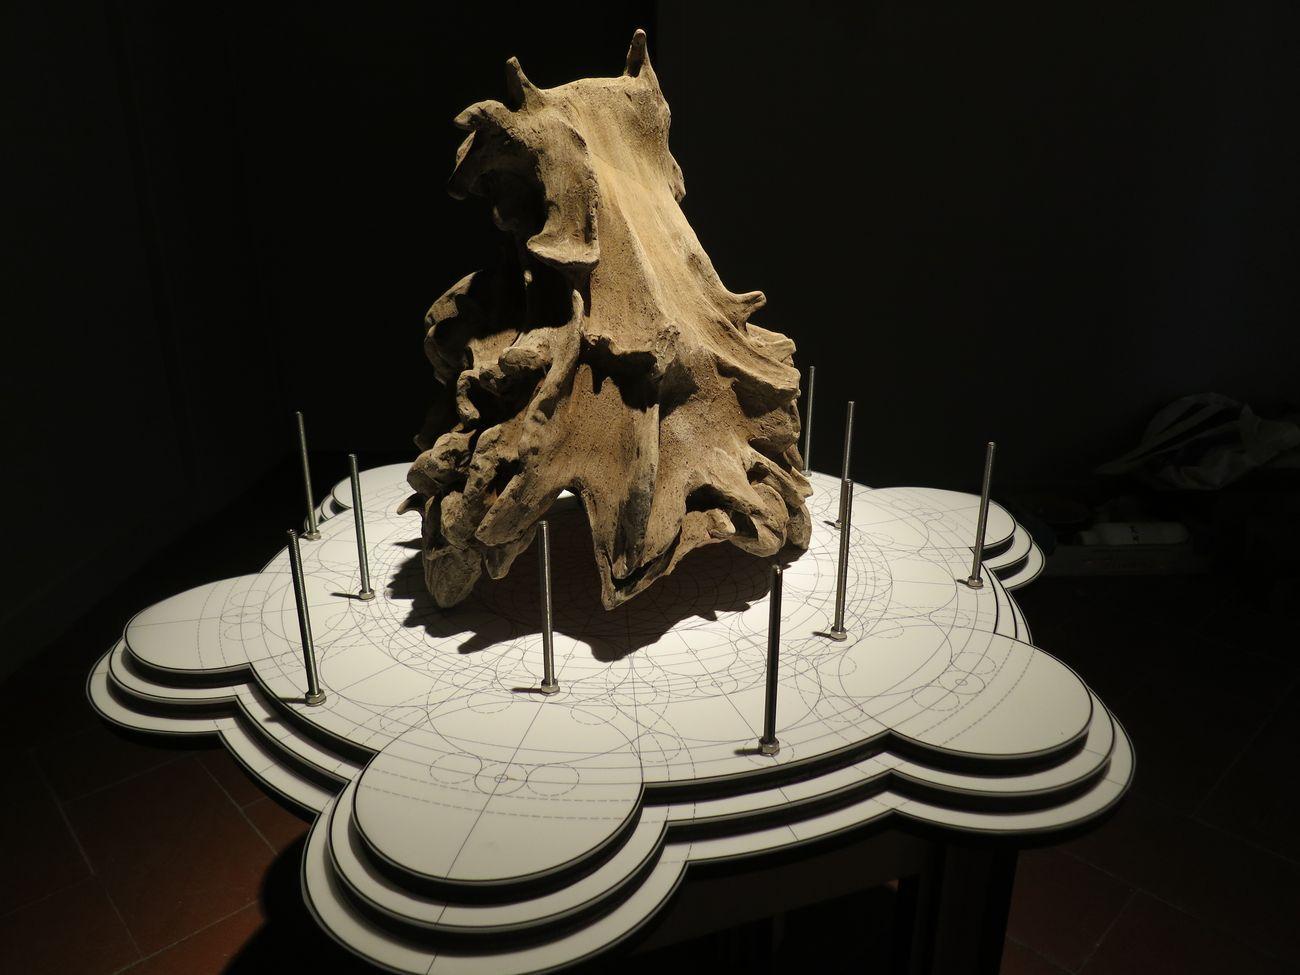 Materia Montelupo. Installation view at Palazzo Podestarile, Montelupo Fiorentino 2017